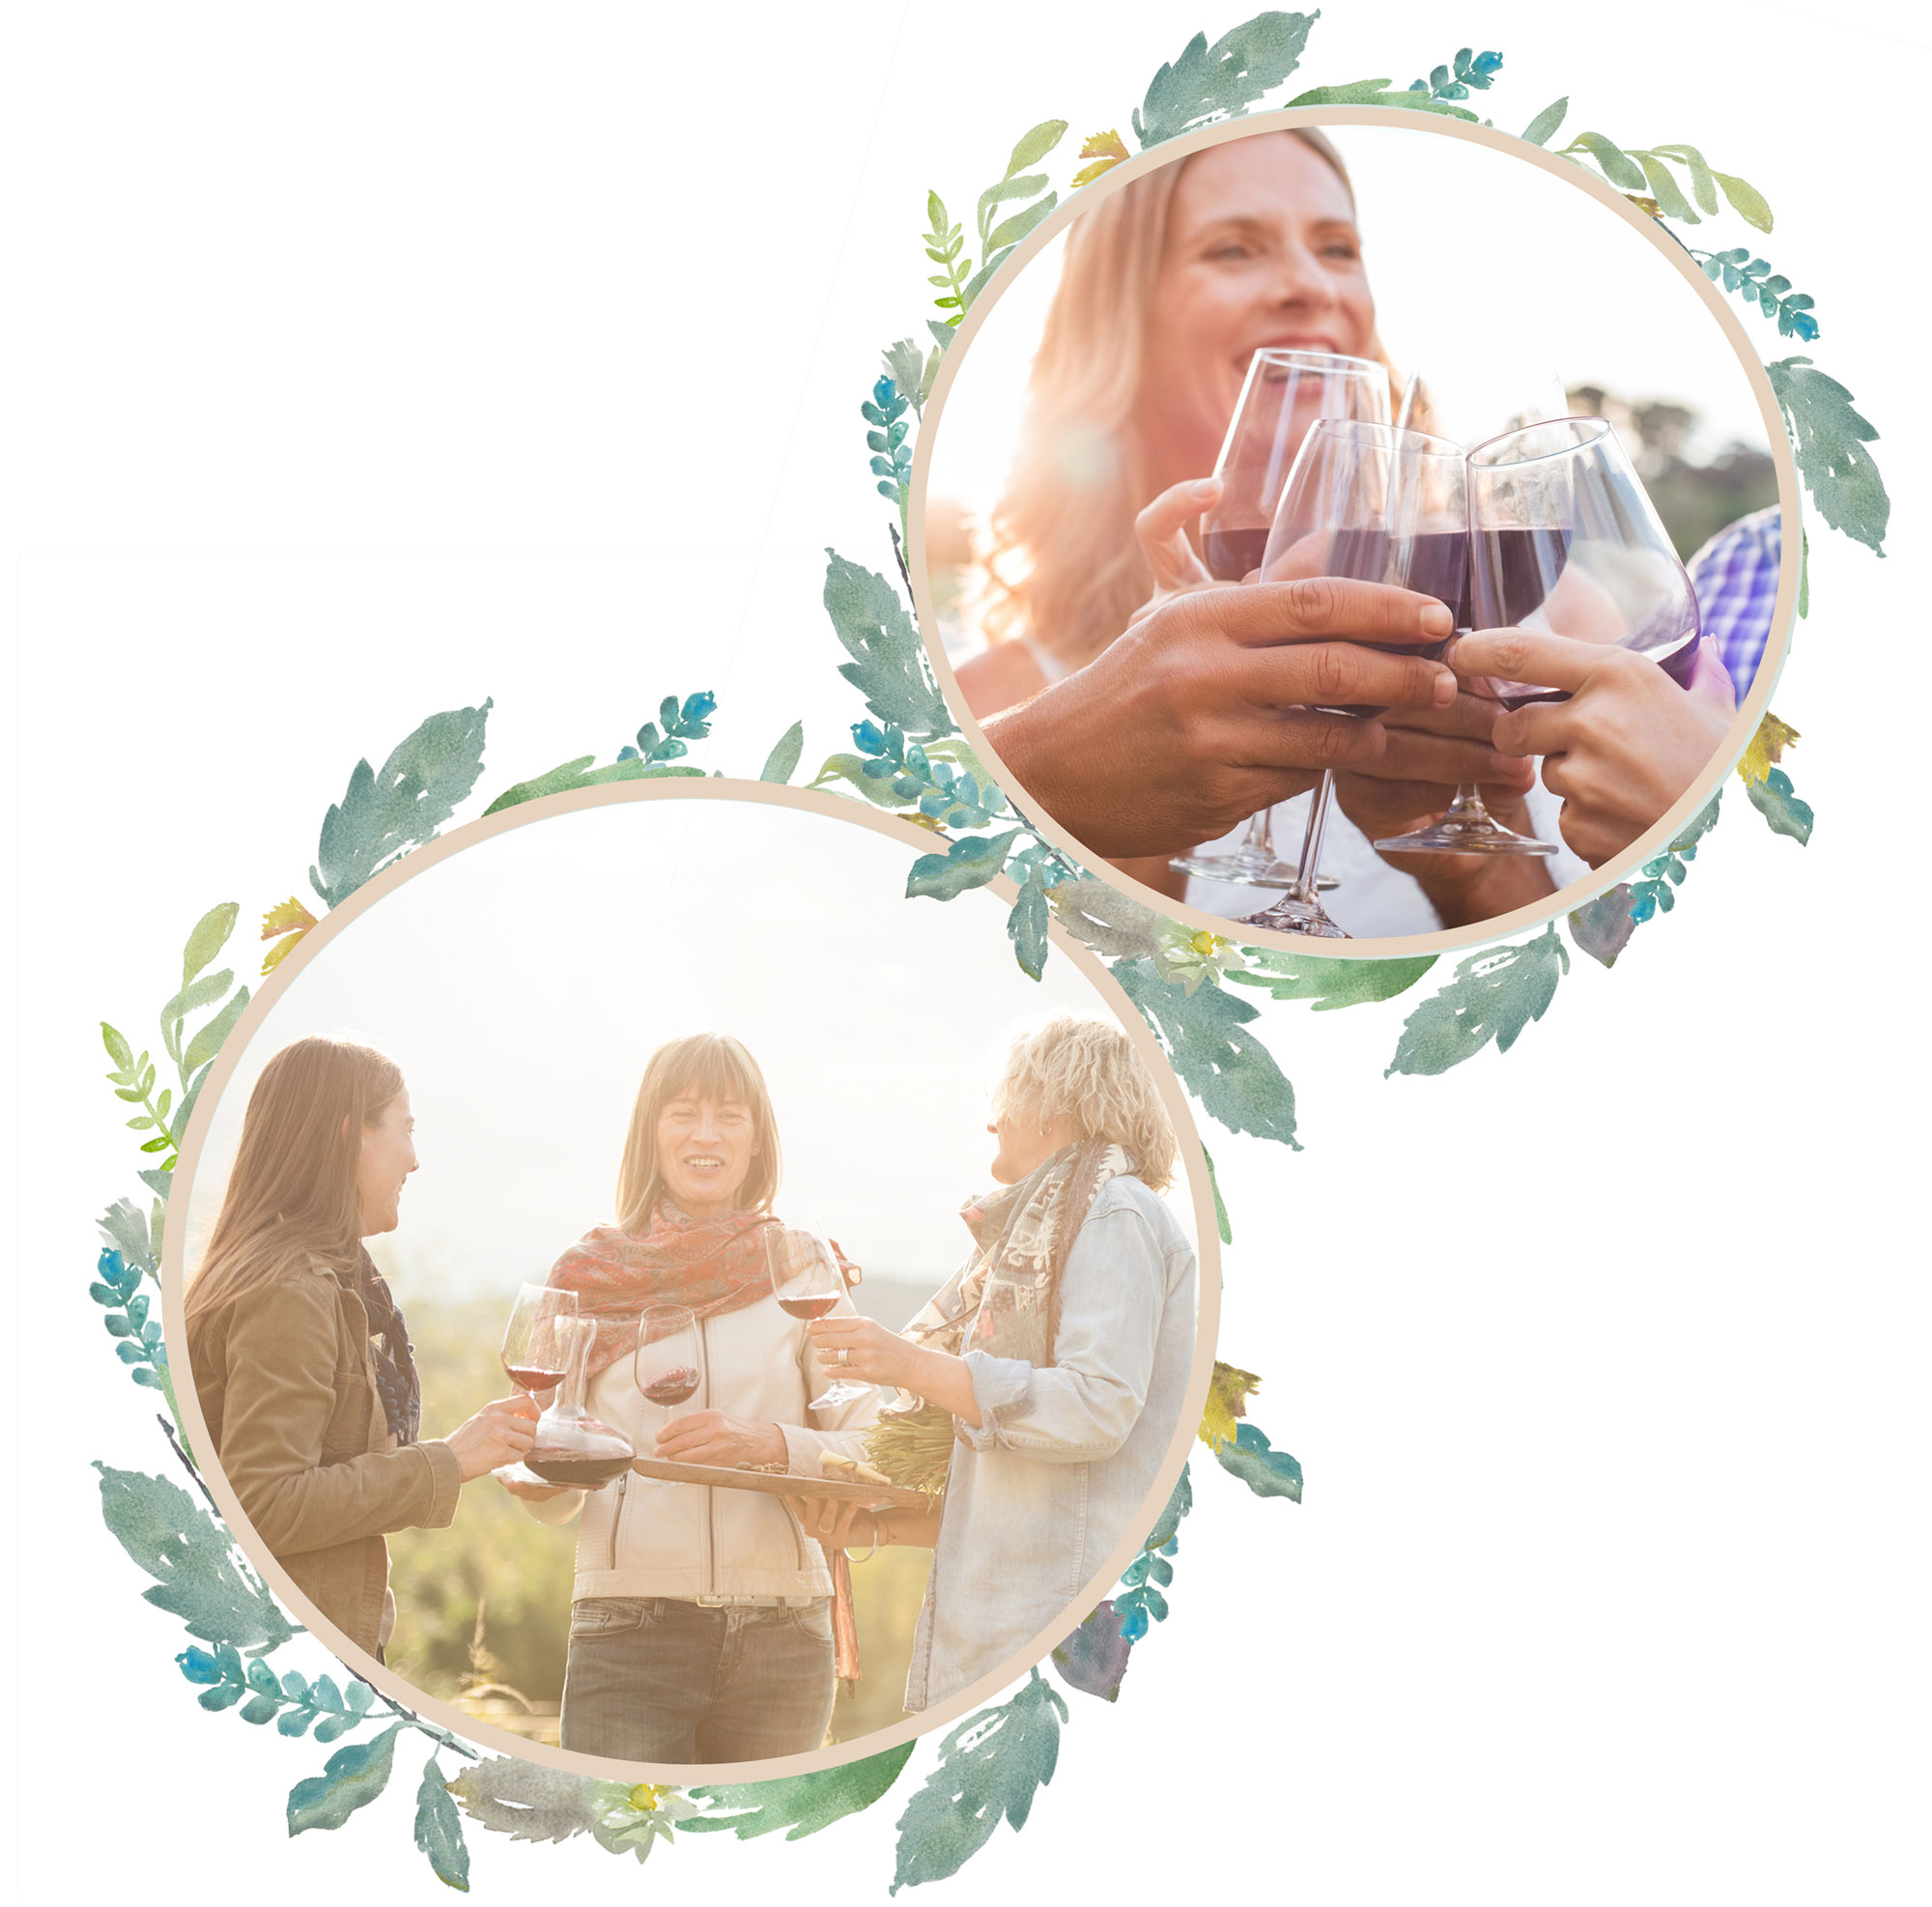 Women-laughing-collage-v5.jpg